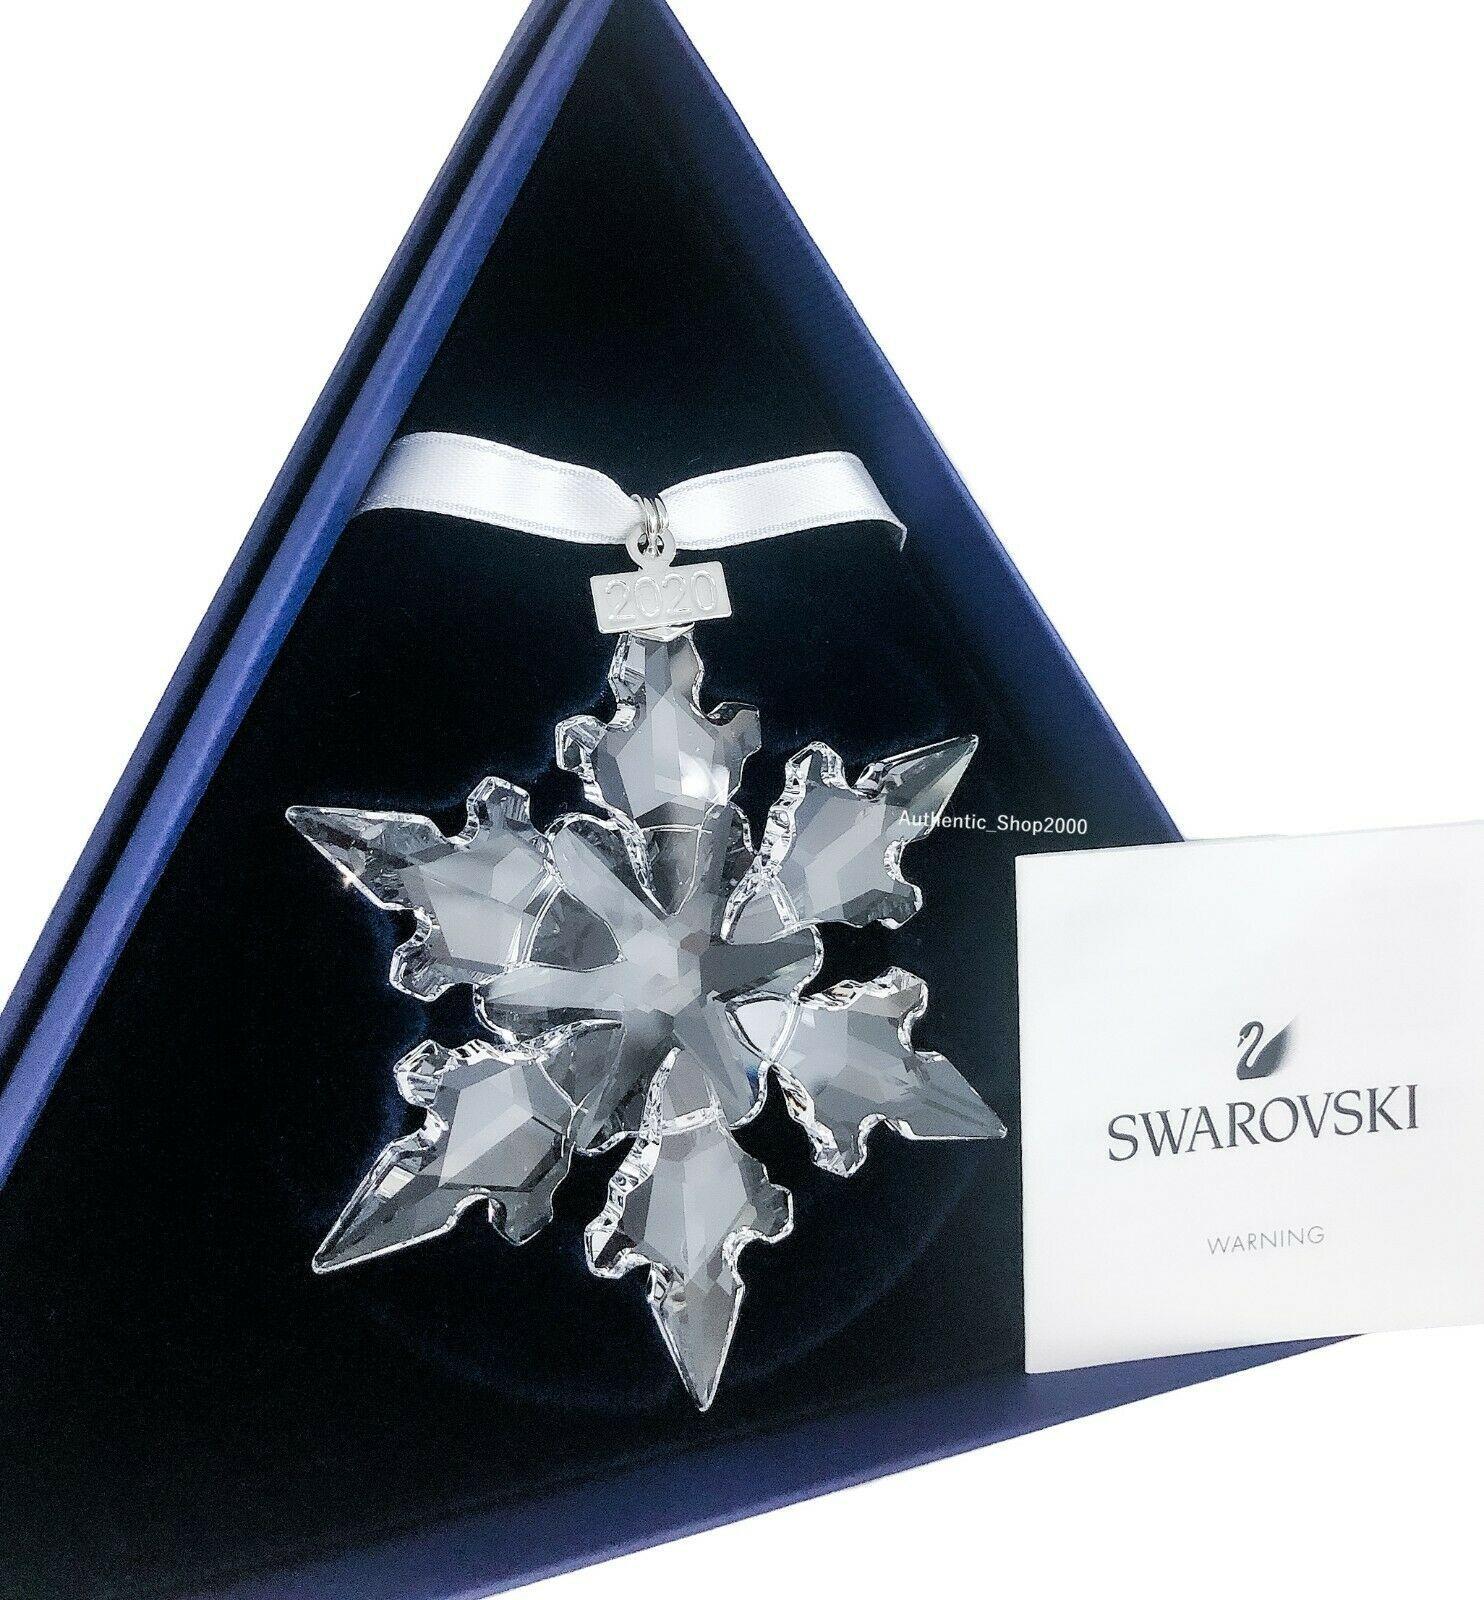 NEW SWAROVSKI SNOWFLAKE CRYSTAL ANNUAL EDITION ORNAMENT 2020